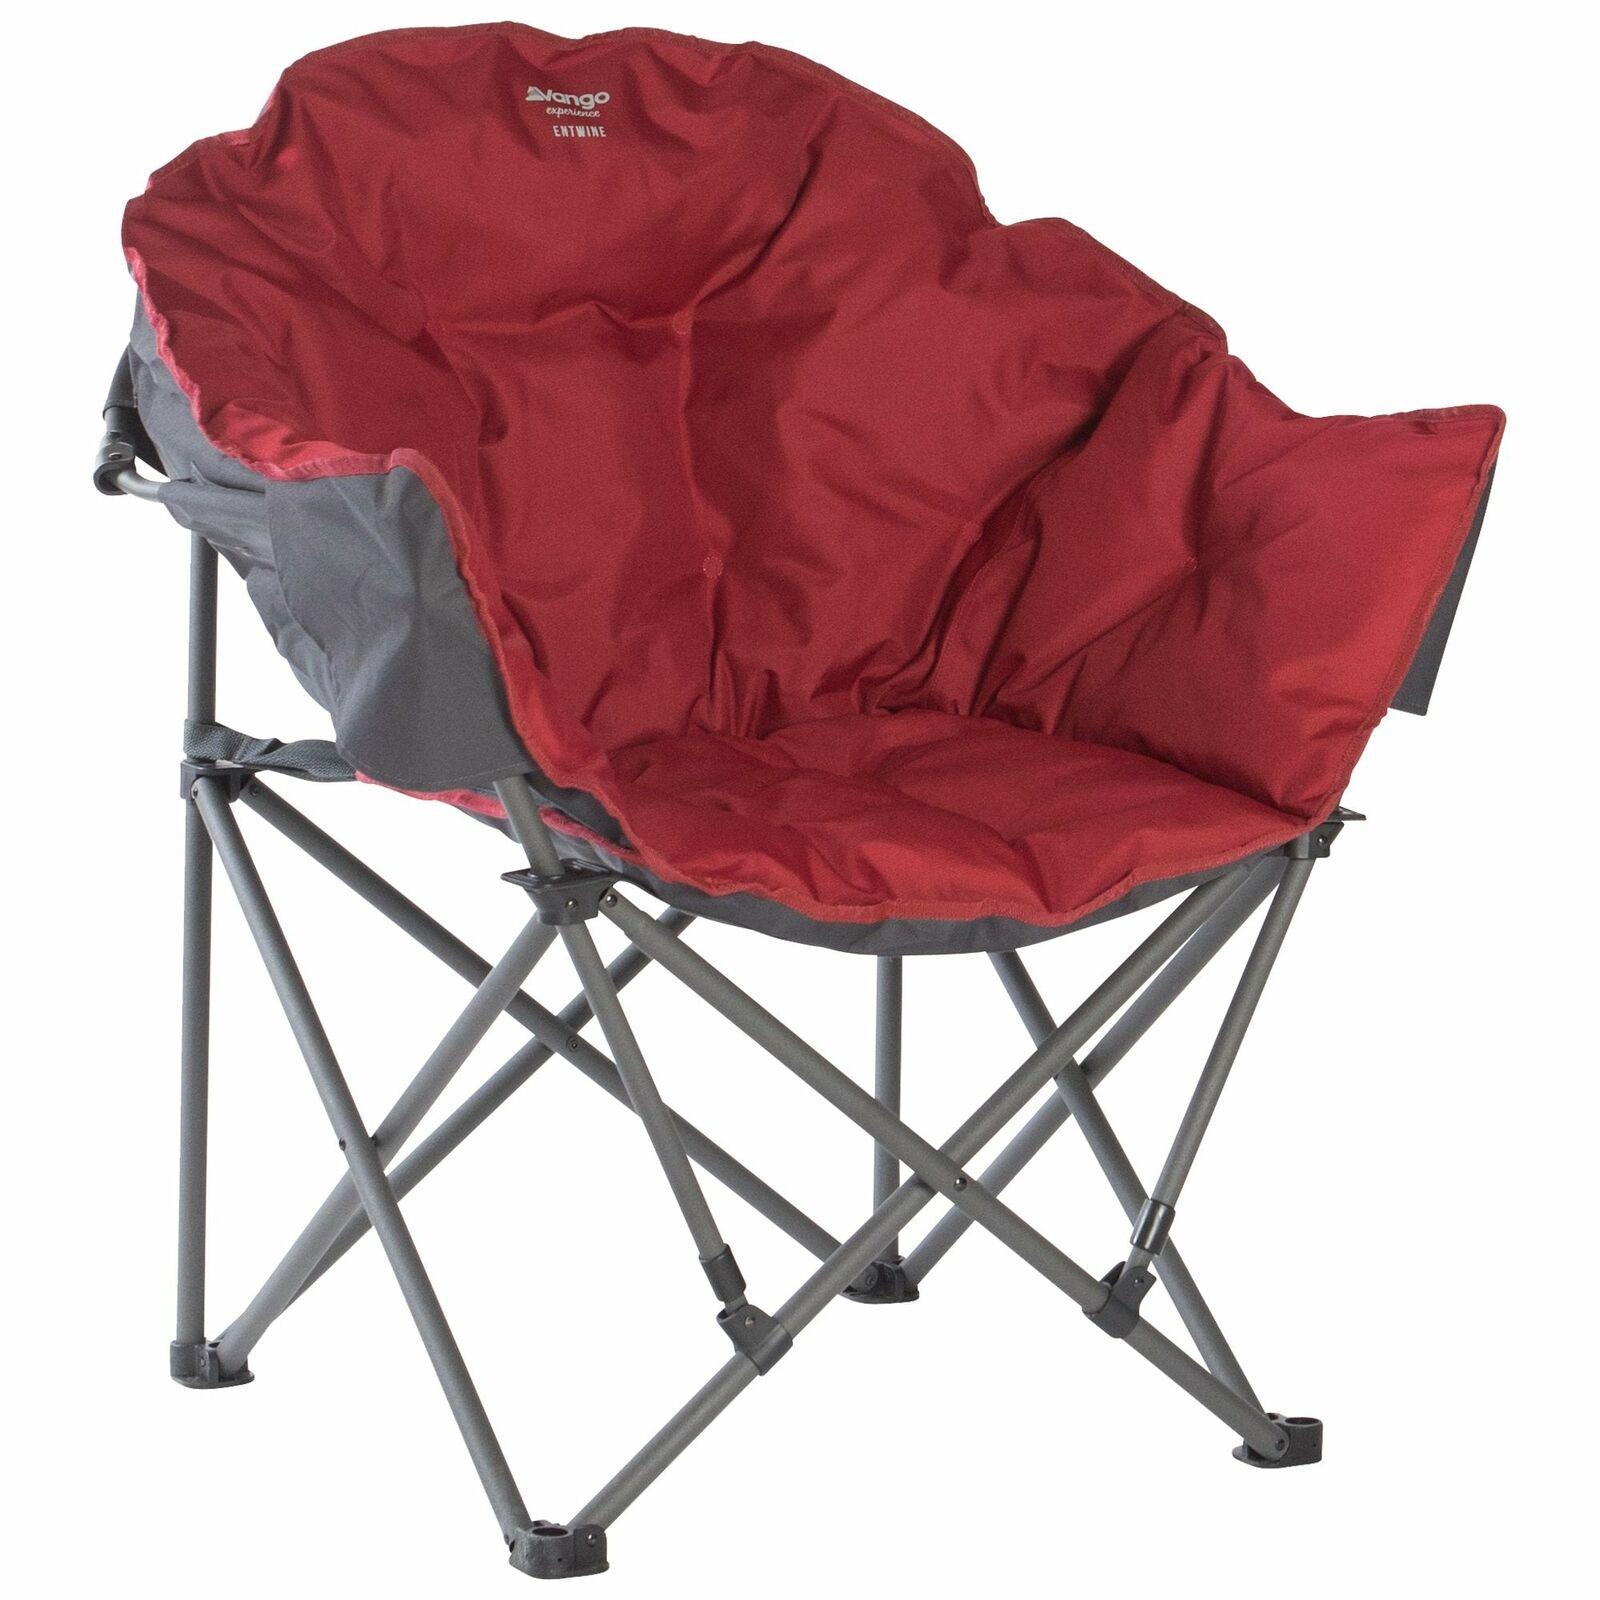 Vango Entwine Chair - rot